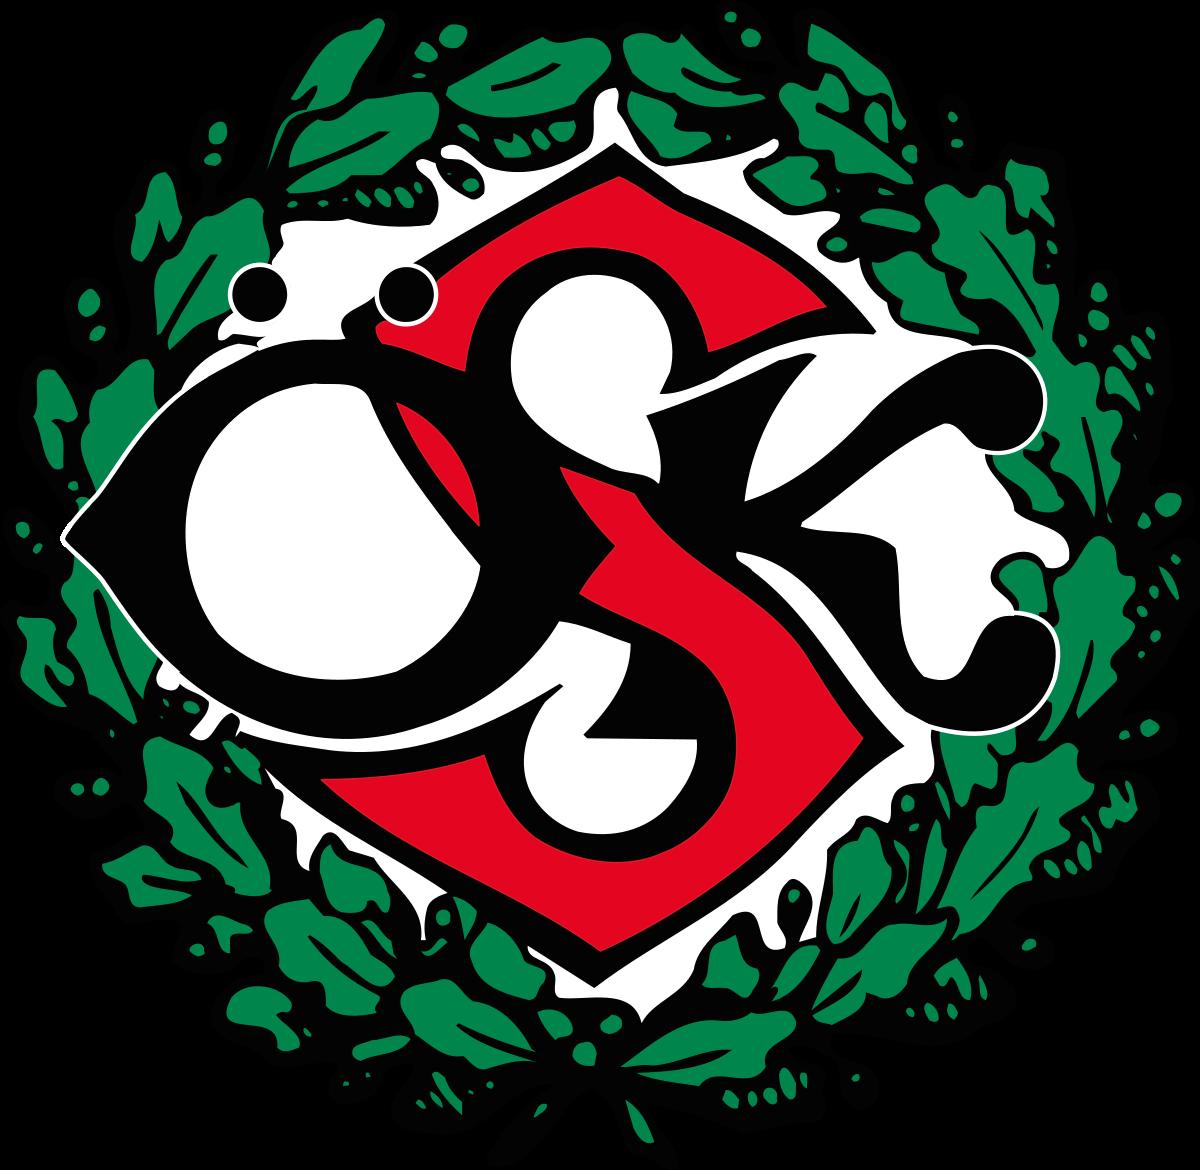 Orebro U-21 logo